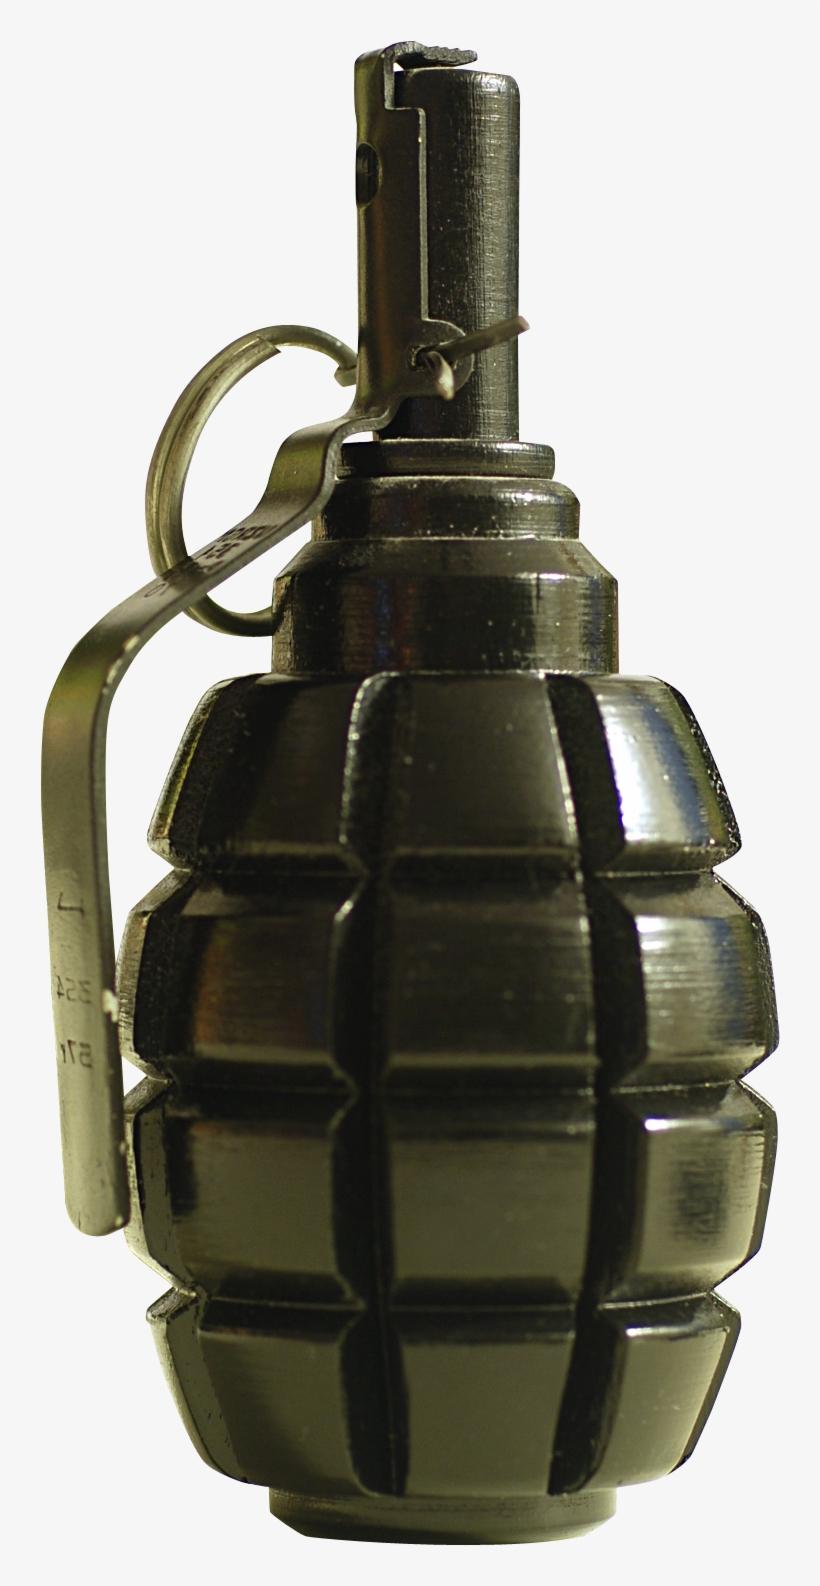 Hand Grenade Png Transparent Image.